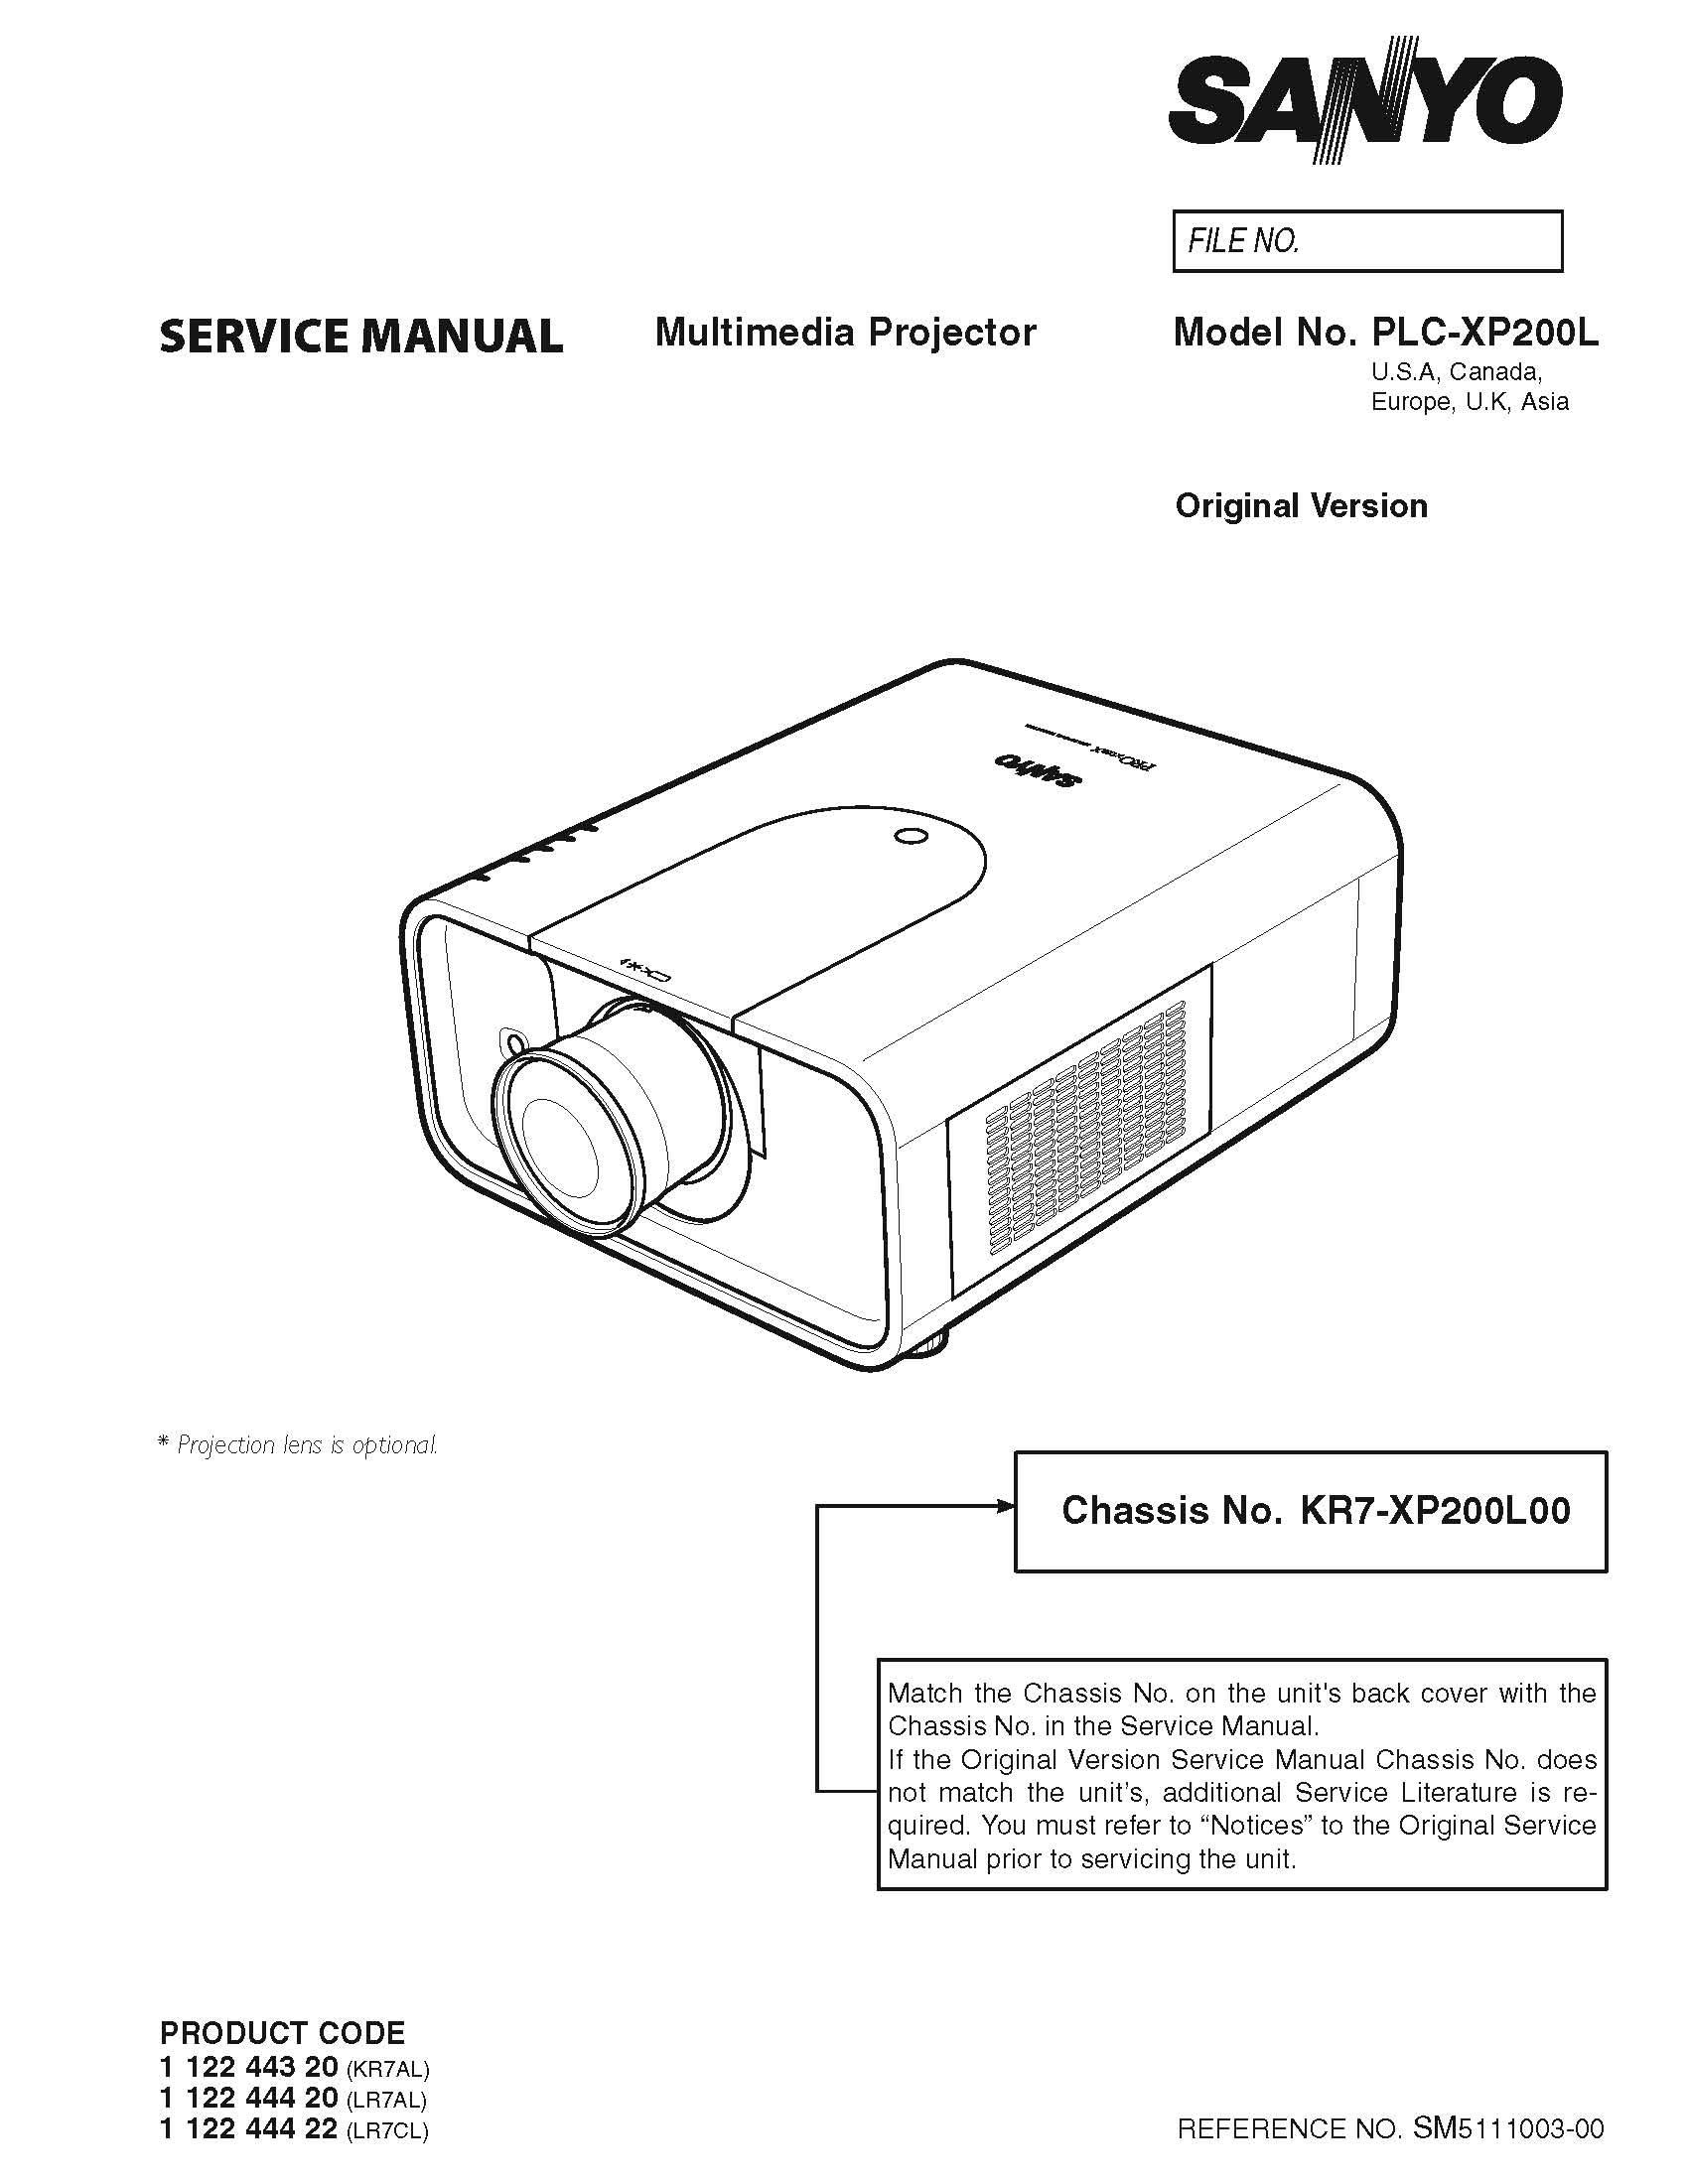 sanyo olcxp200l plc xp200l service manual sanyo amazon com books rh amazon com